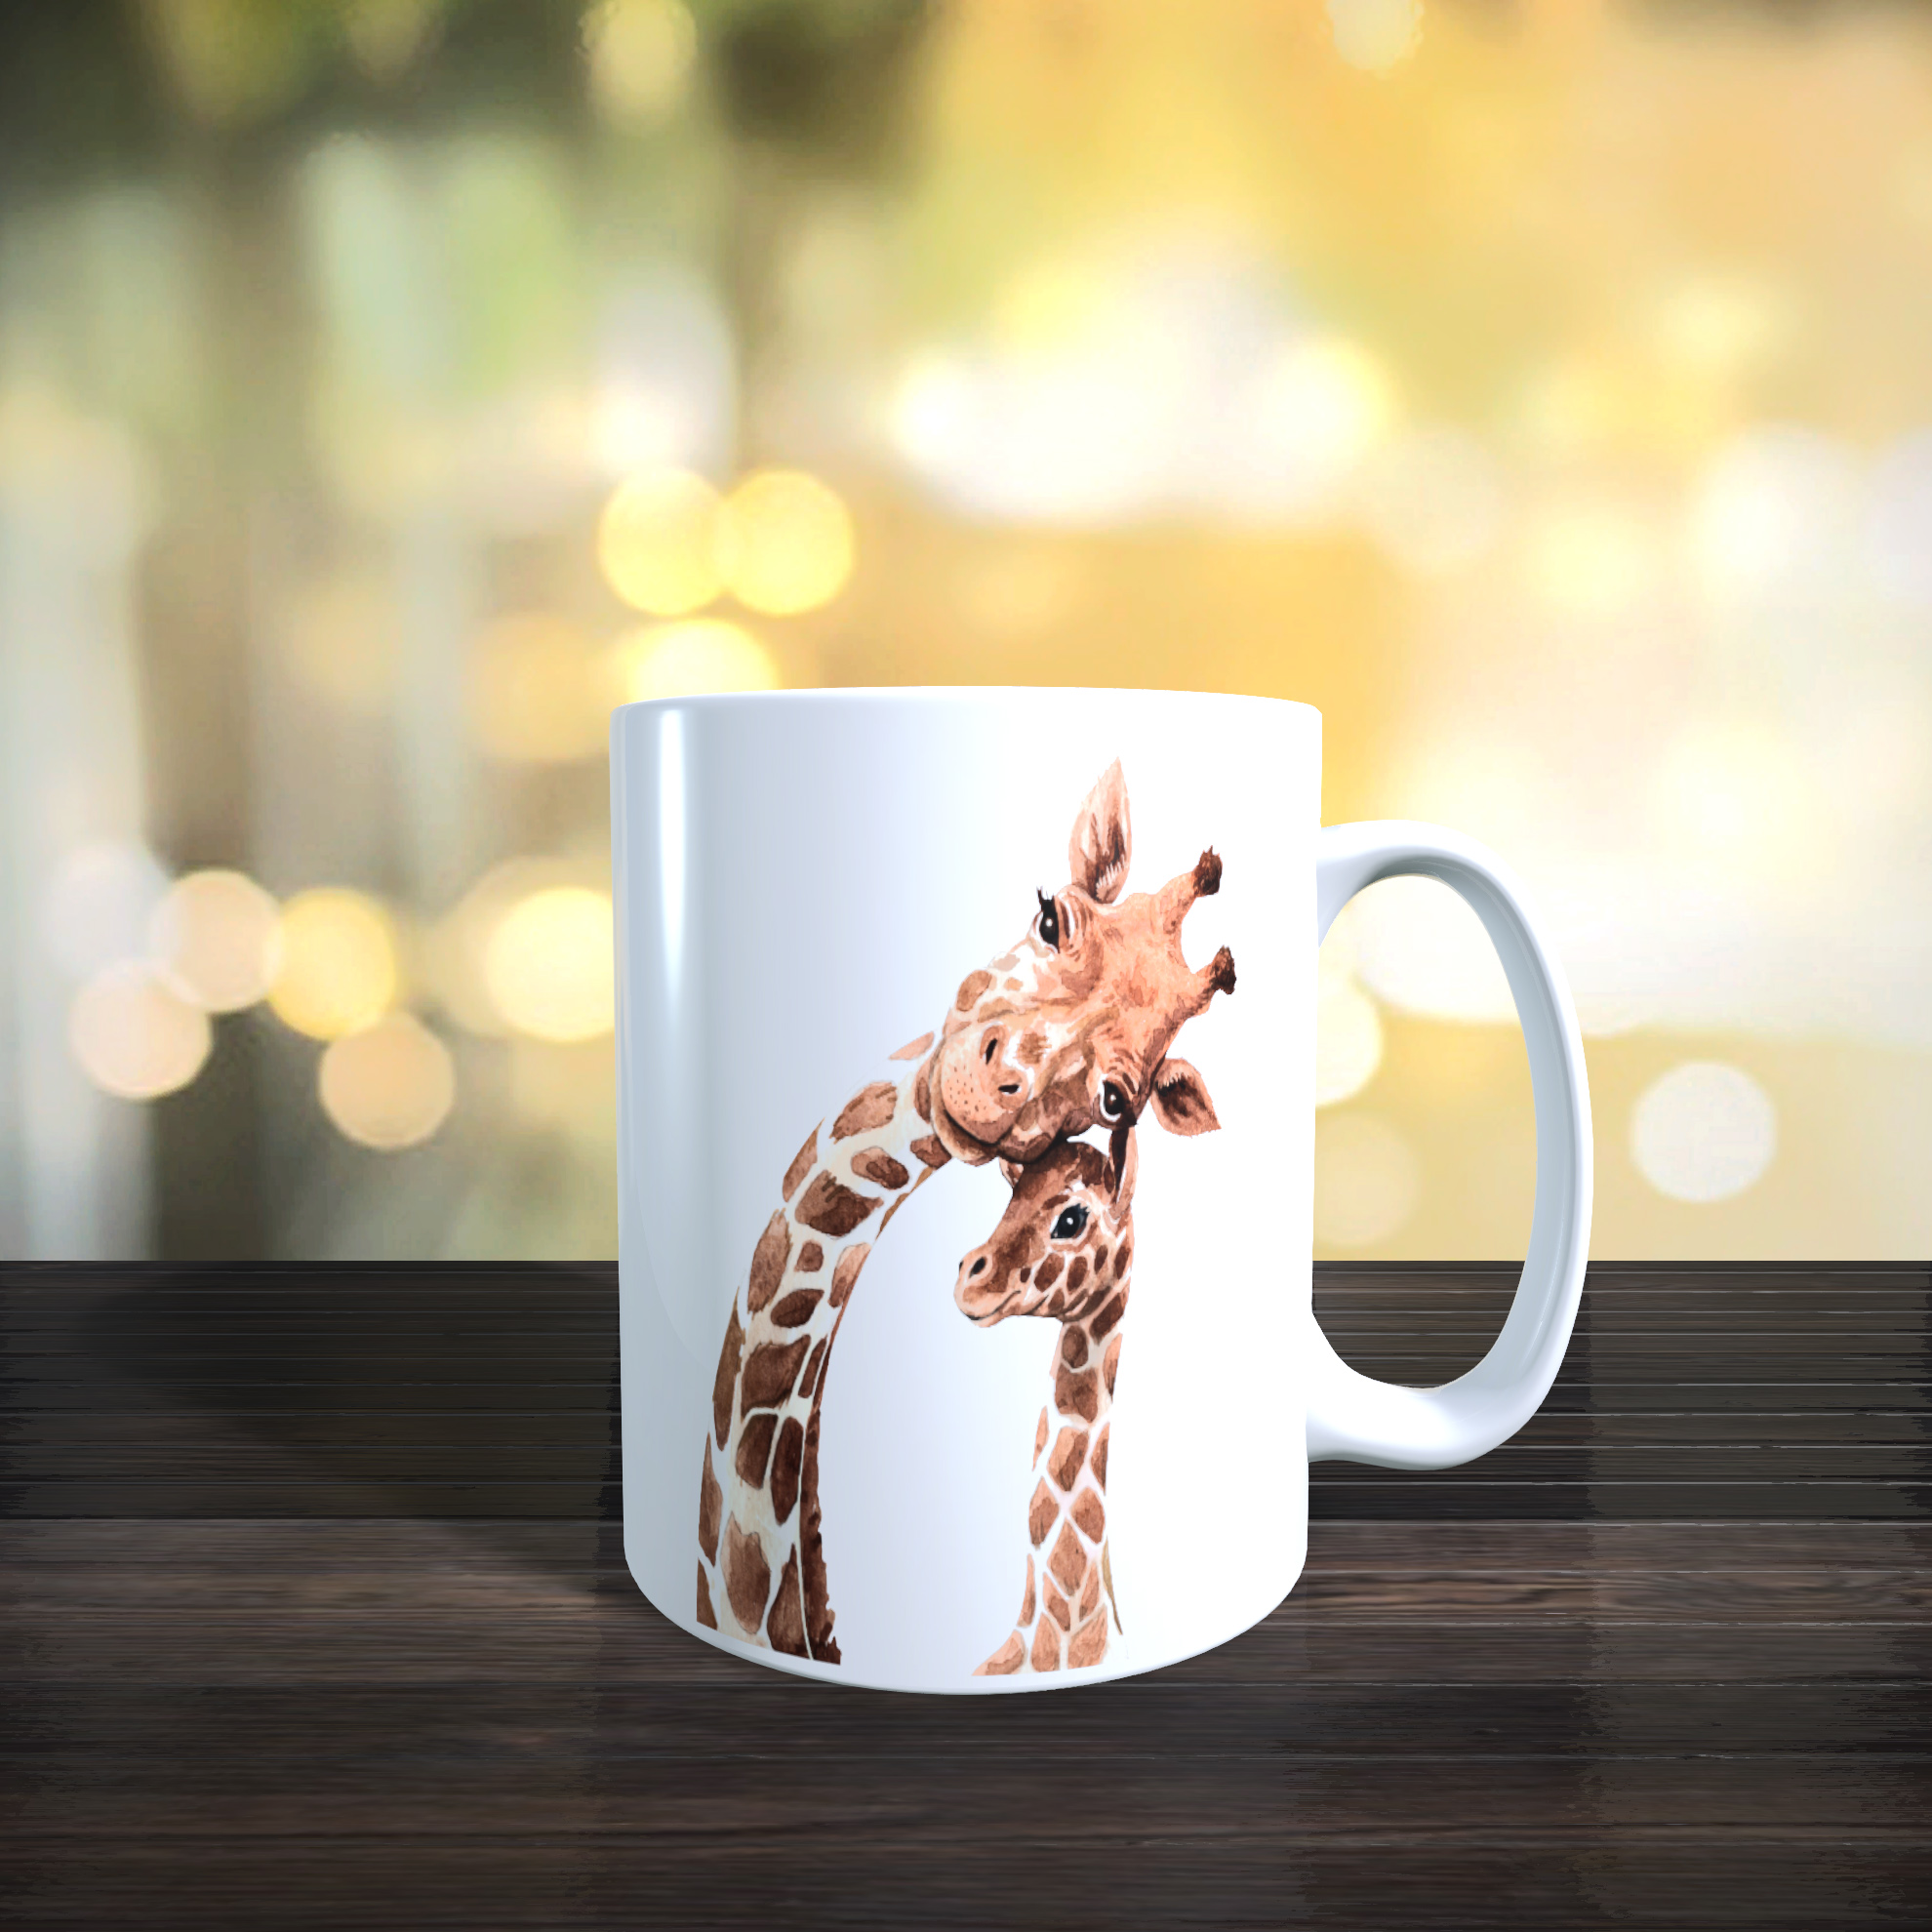 Cute Mother and Baby Giraffe 11oz Ceramic Mothers Day / Birthday Gift Mug.